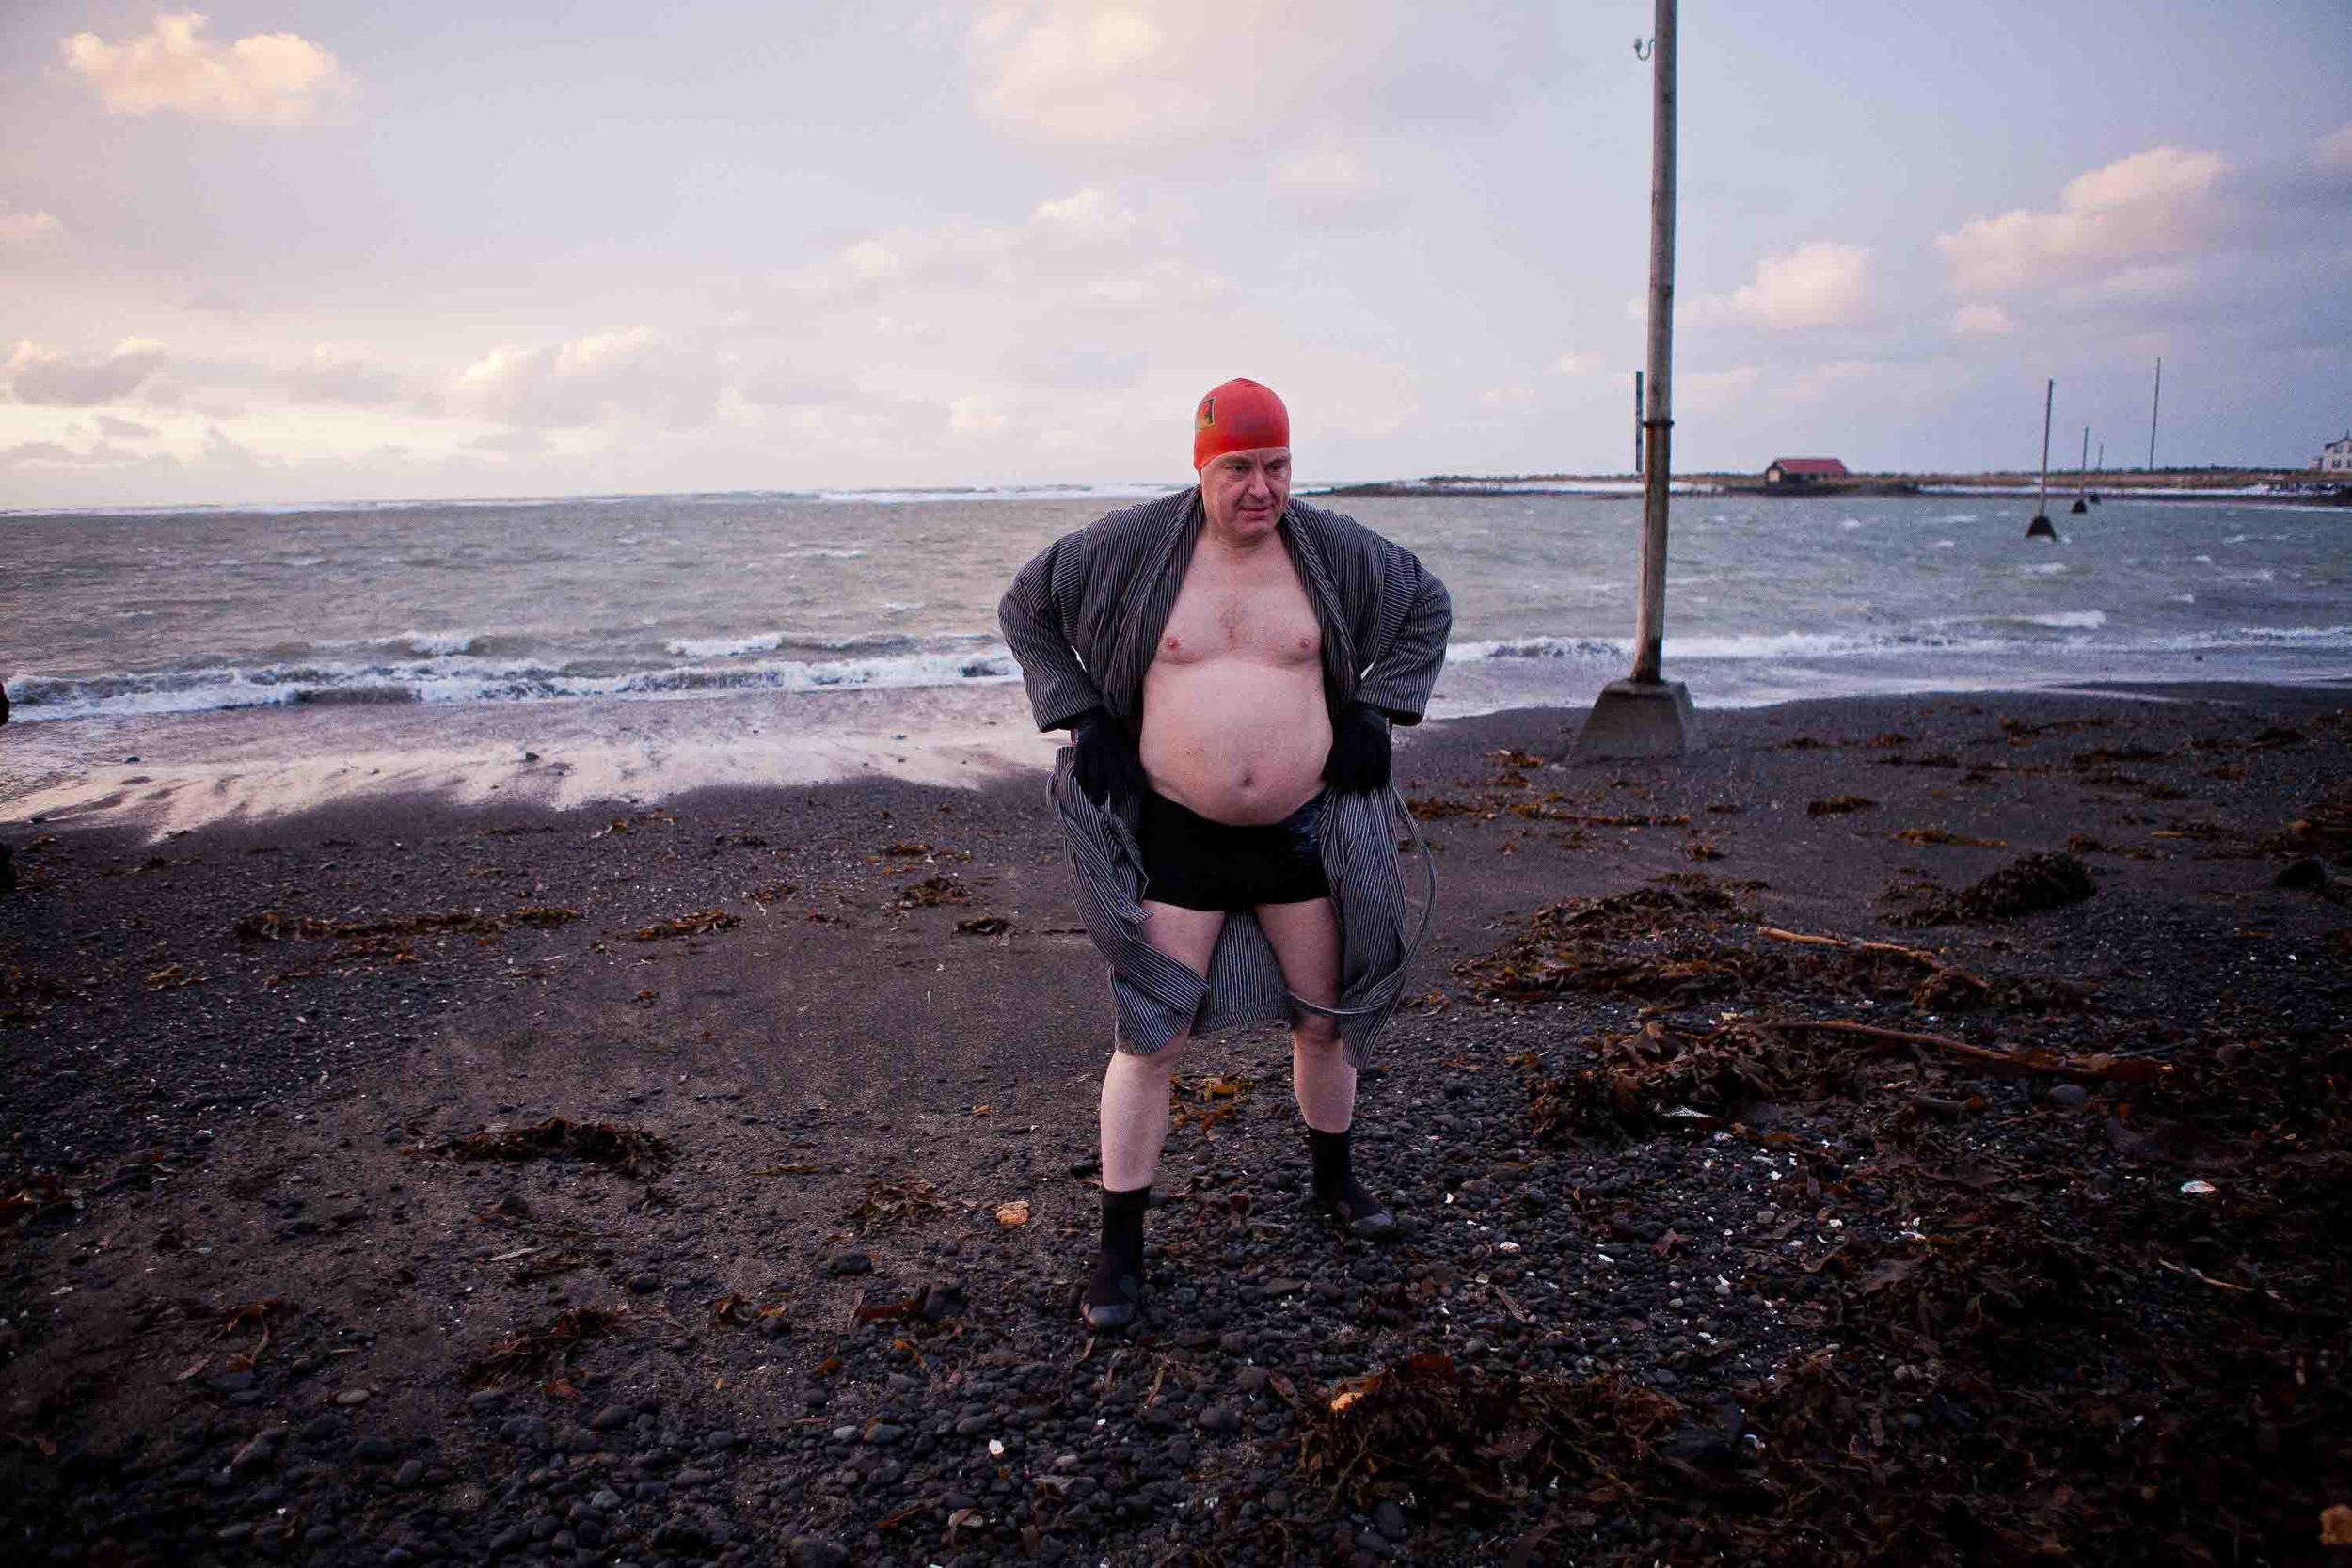 bryce-johnson-photography-actor-world-travel-explorer-photo-20.jpg